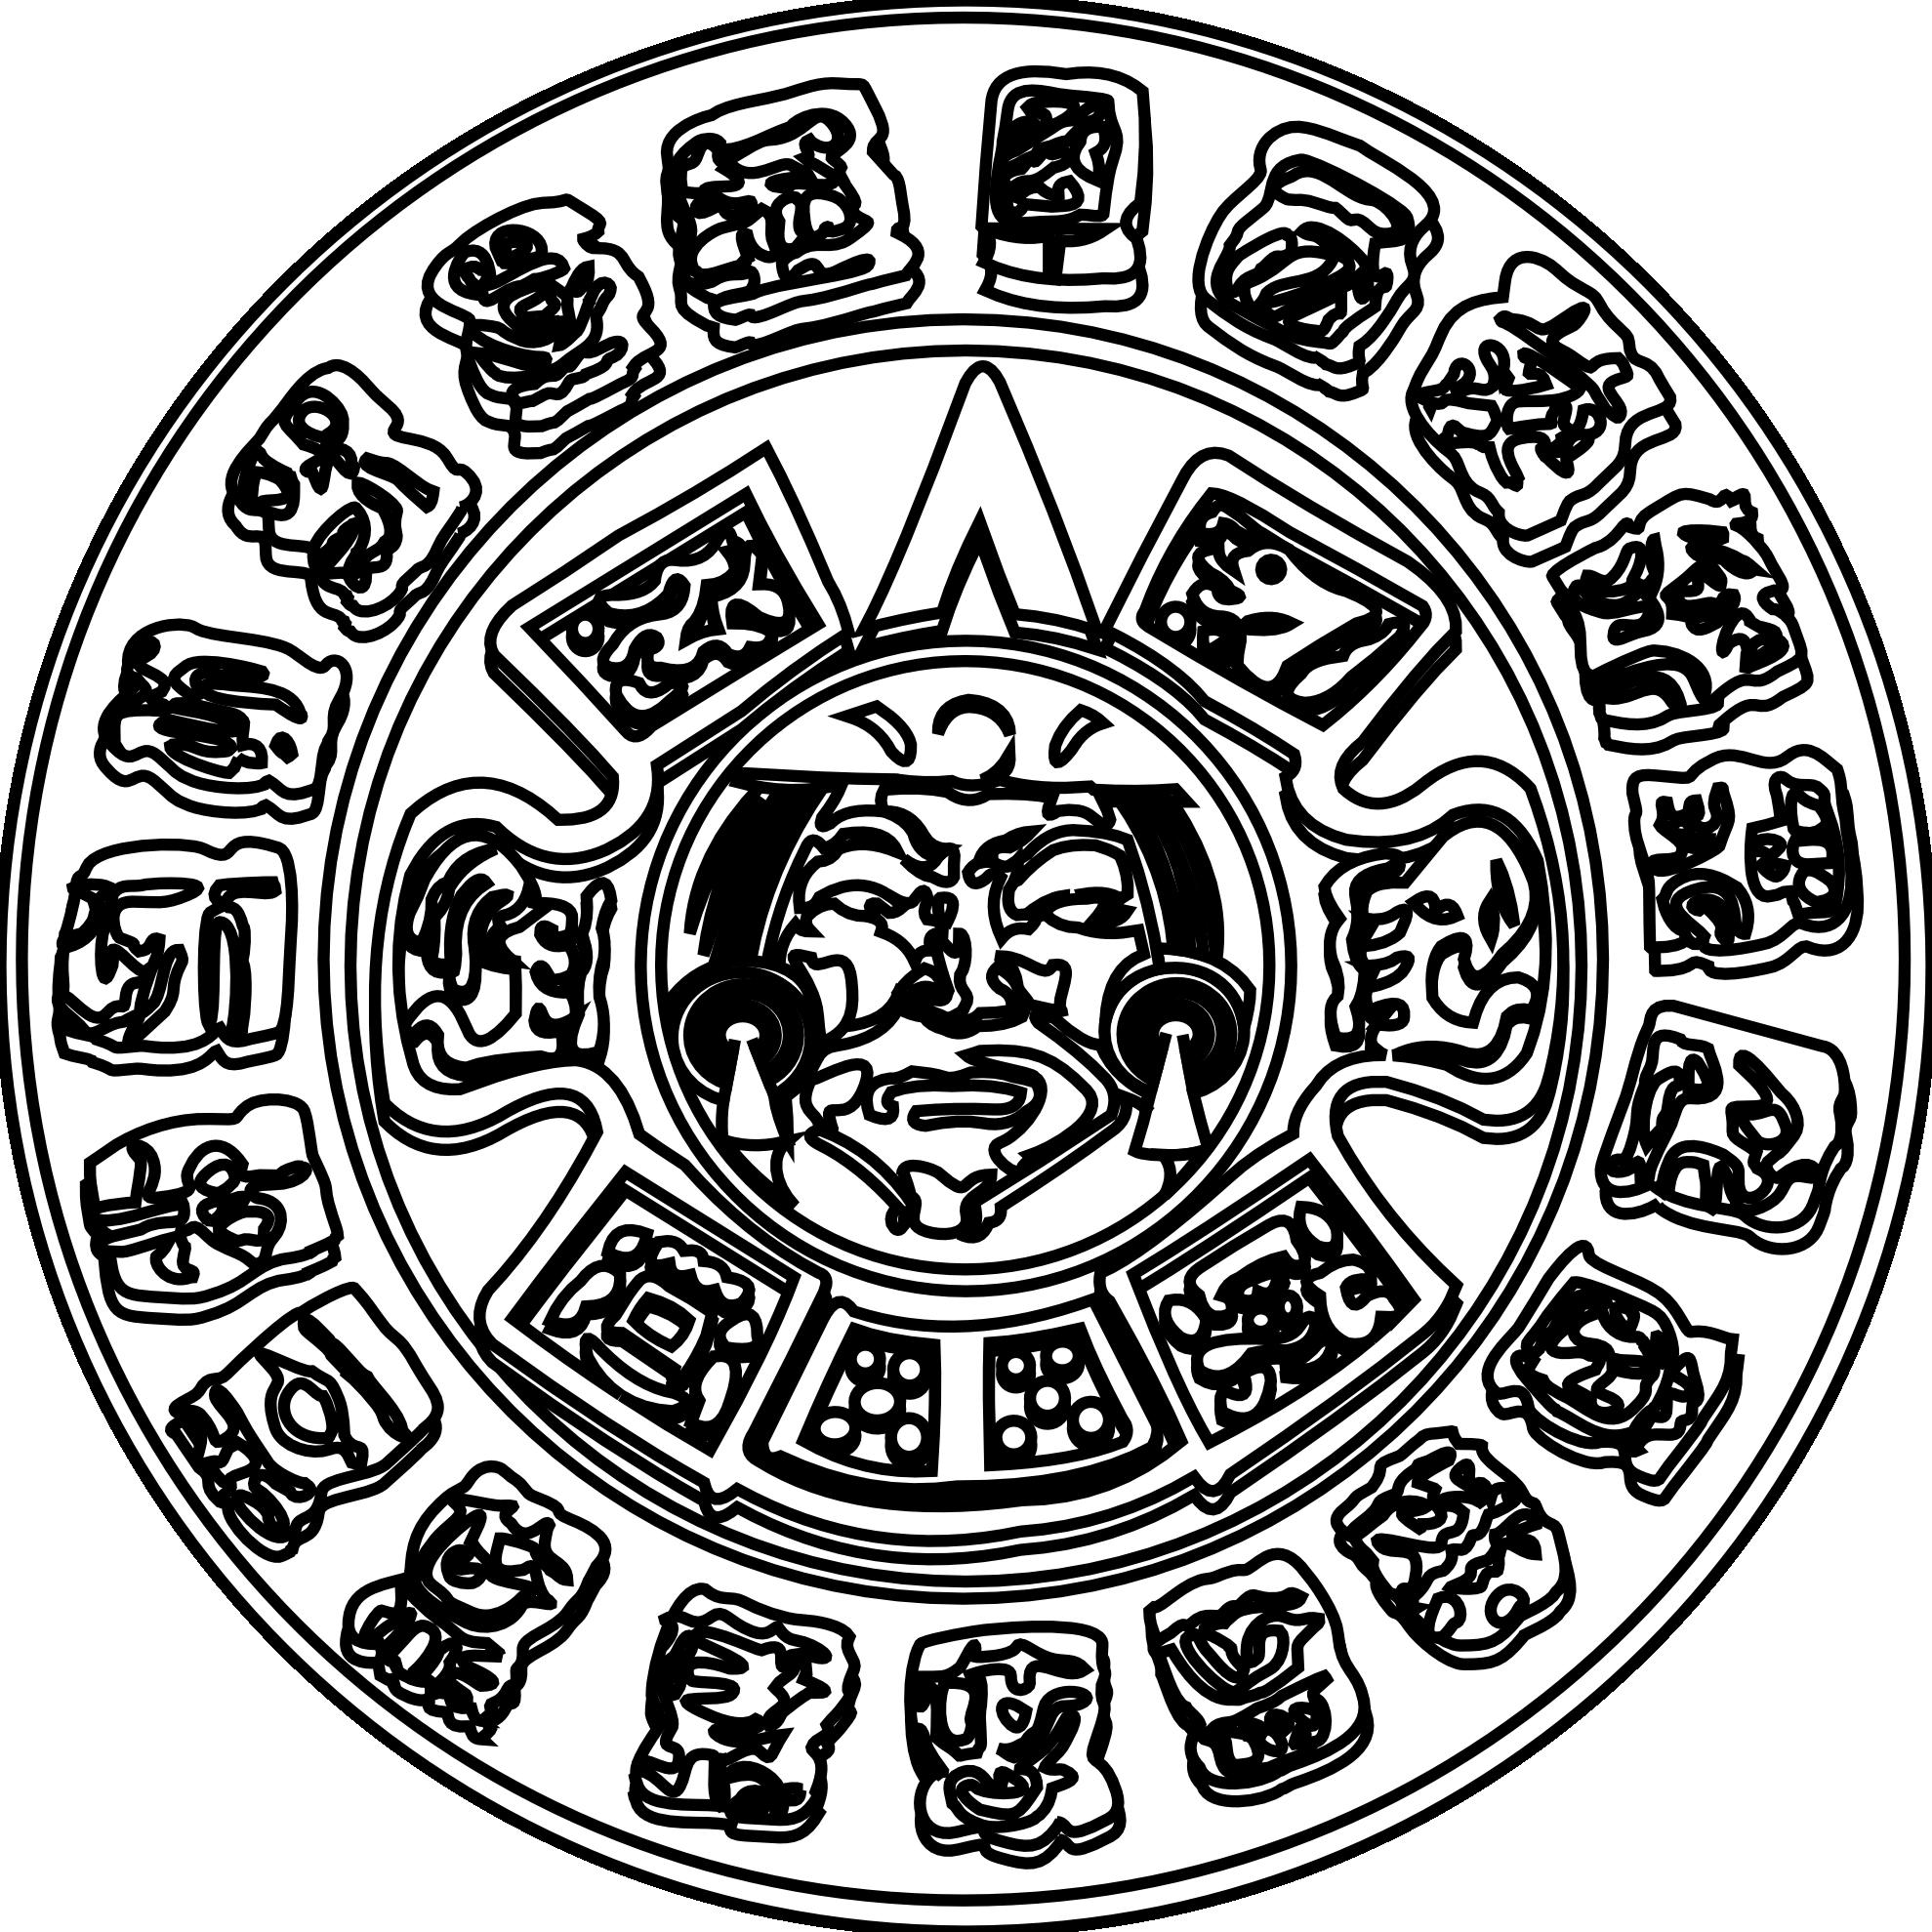 1979x1979 Mayan Calendar Coloring Page Free Mayan Calendar Coloring Page